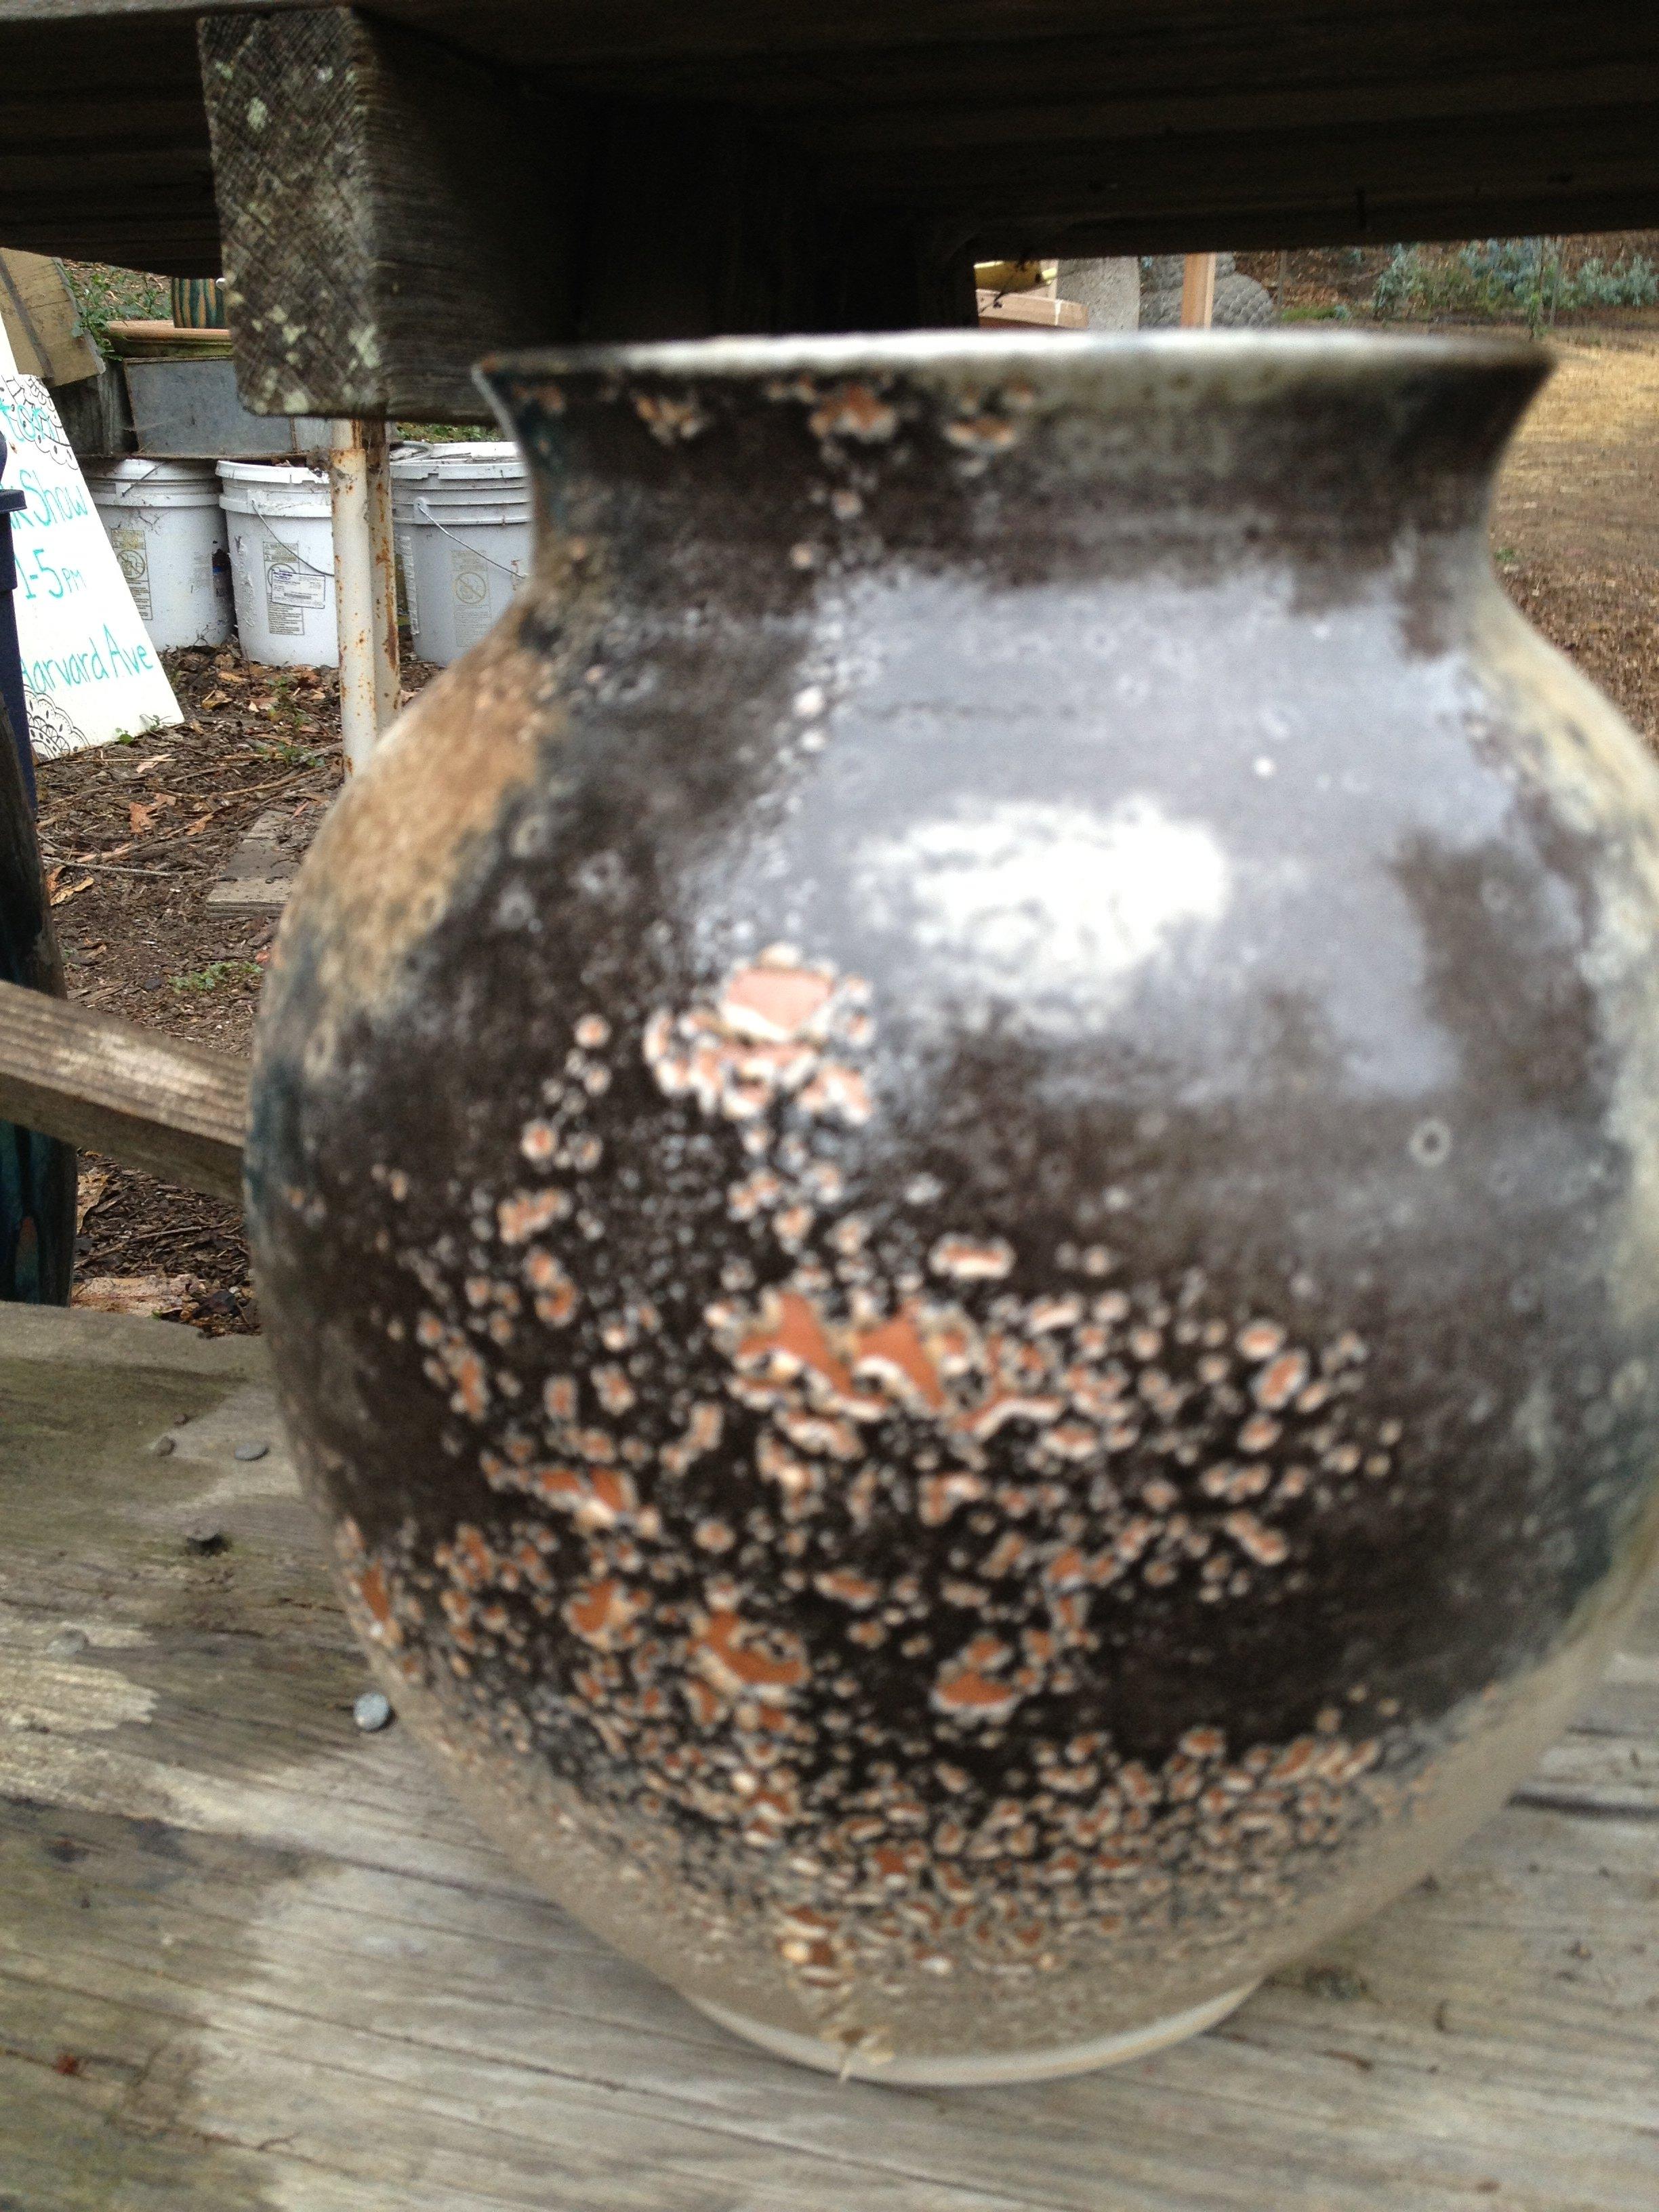 Carbon trap shino vase